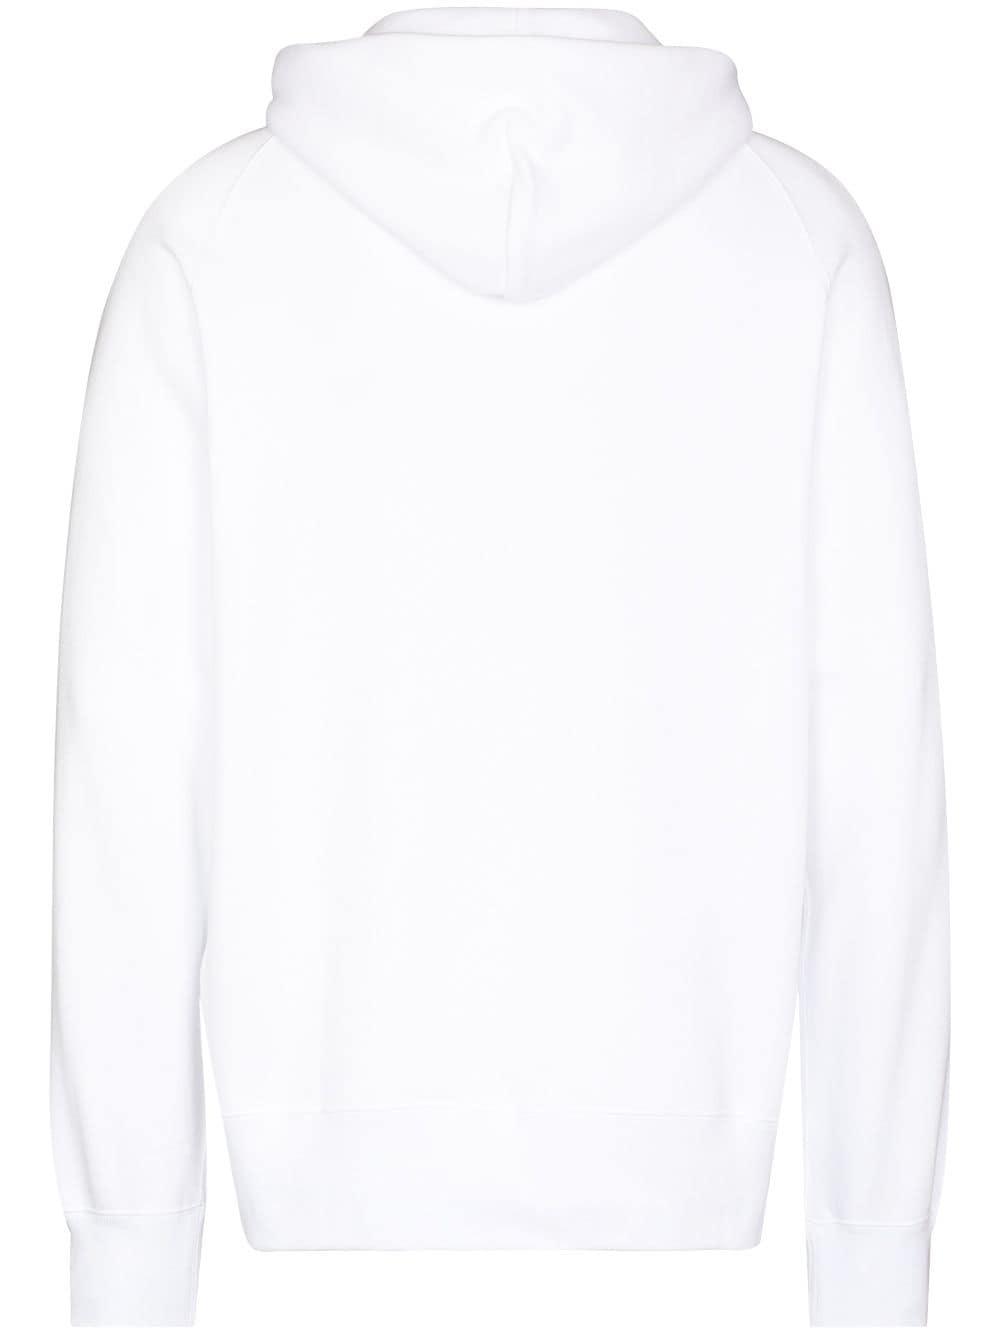 felpa kaws uomo bianca in cotone KAWS X SACAI | Felpe | 21-0286S110